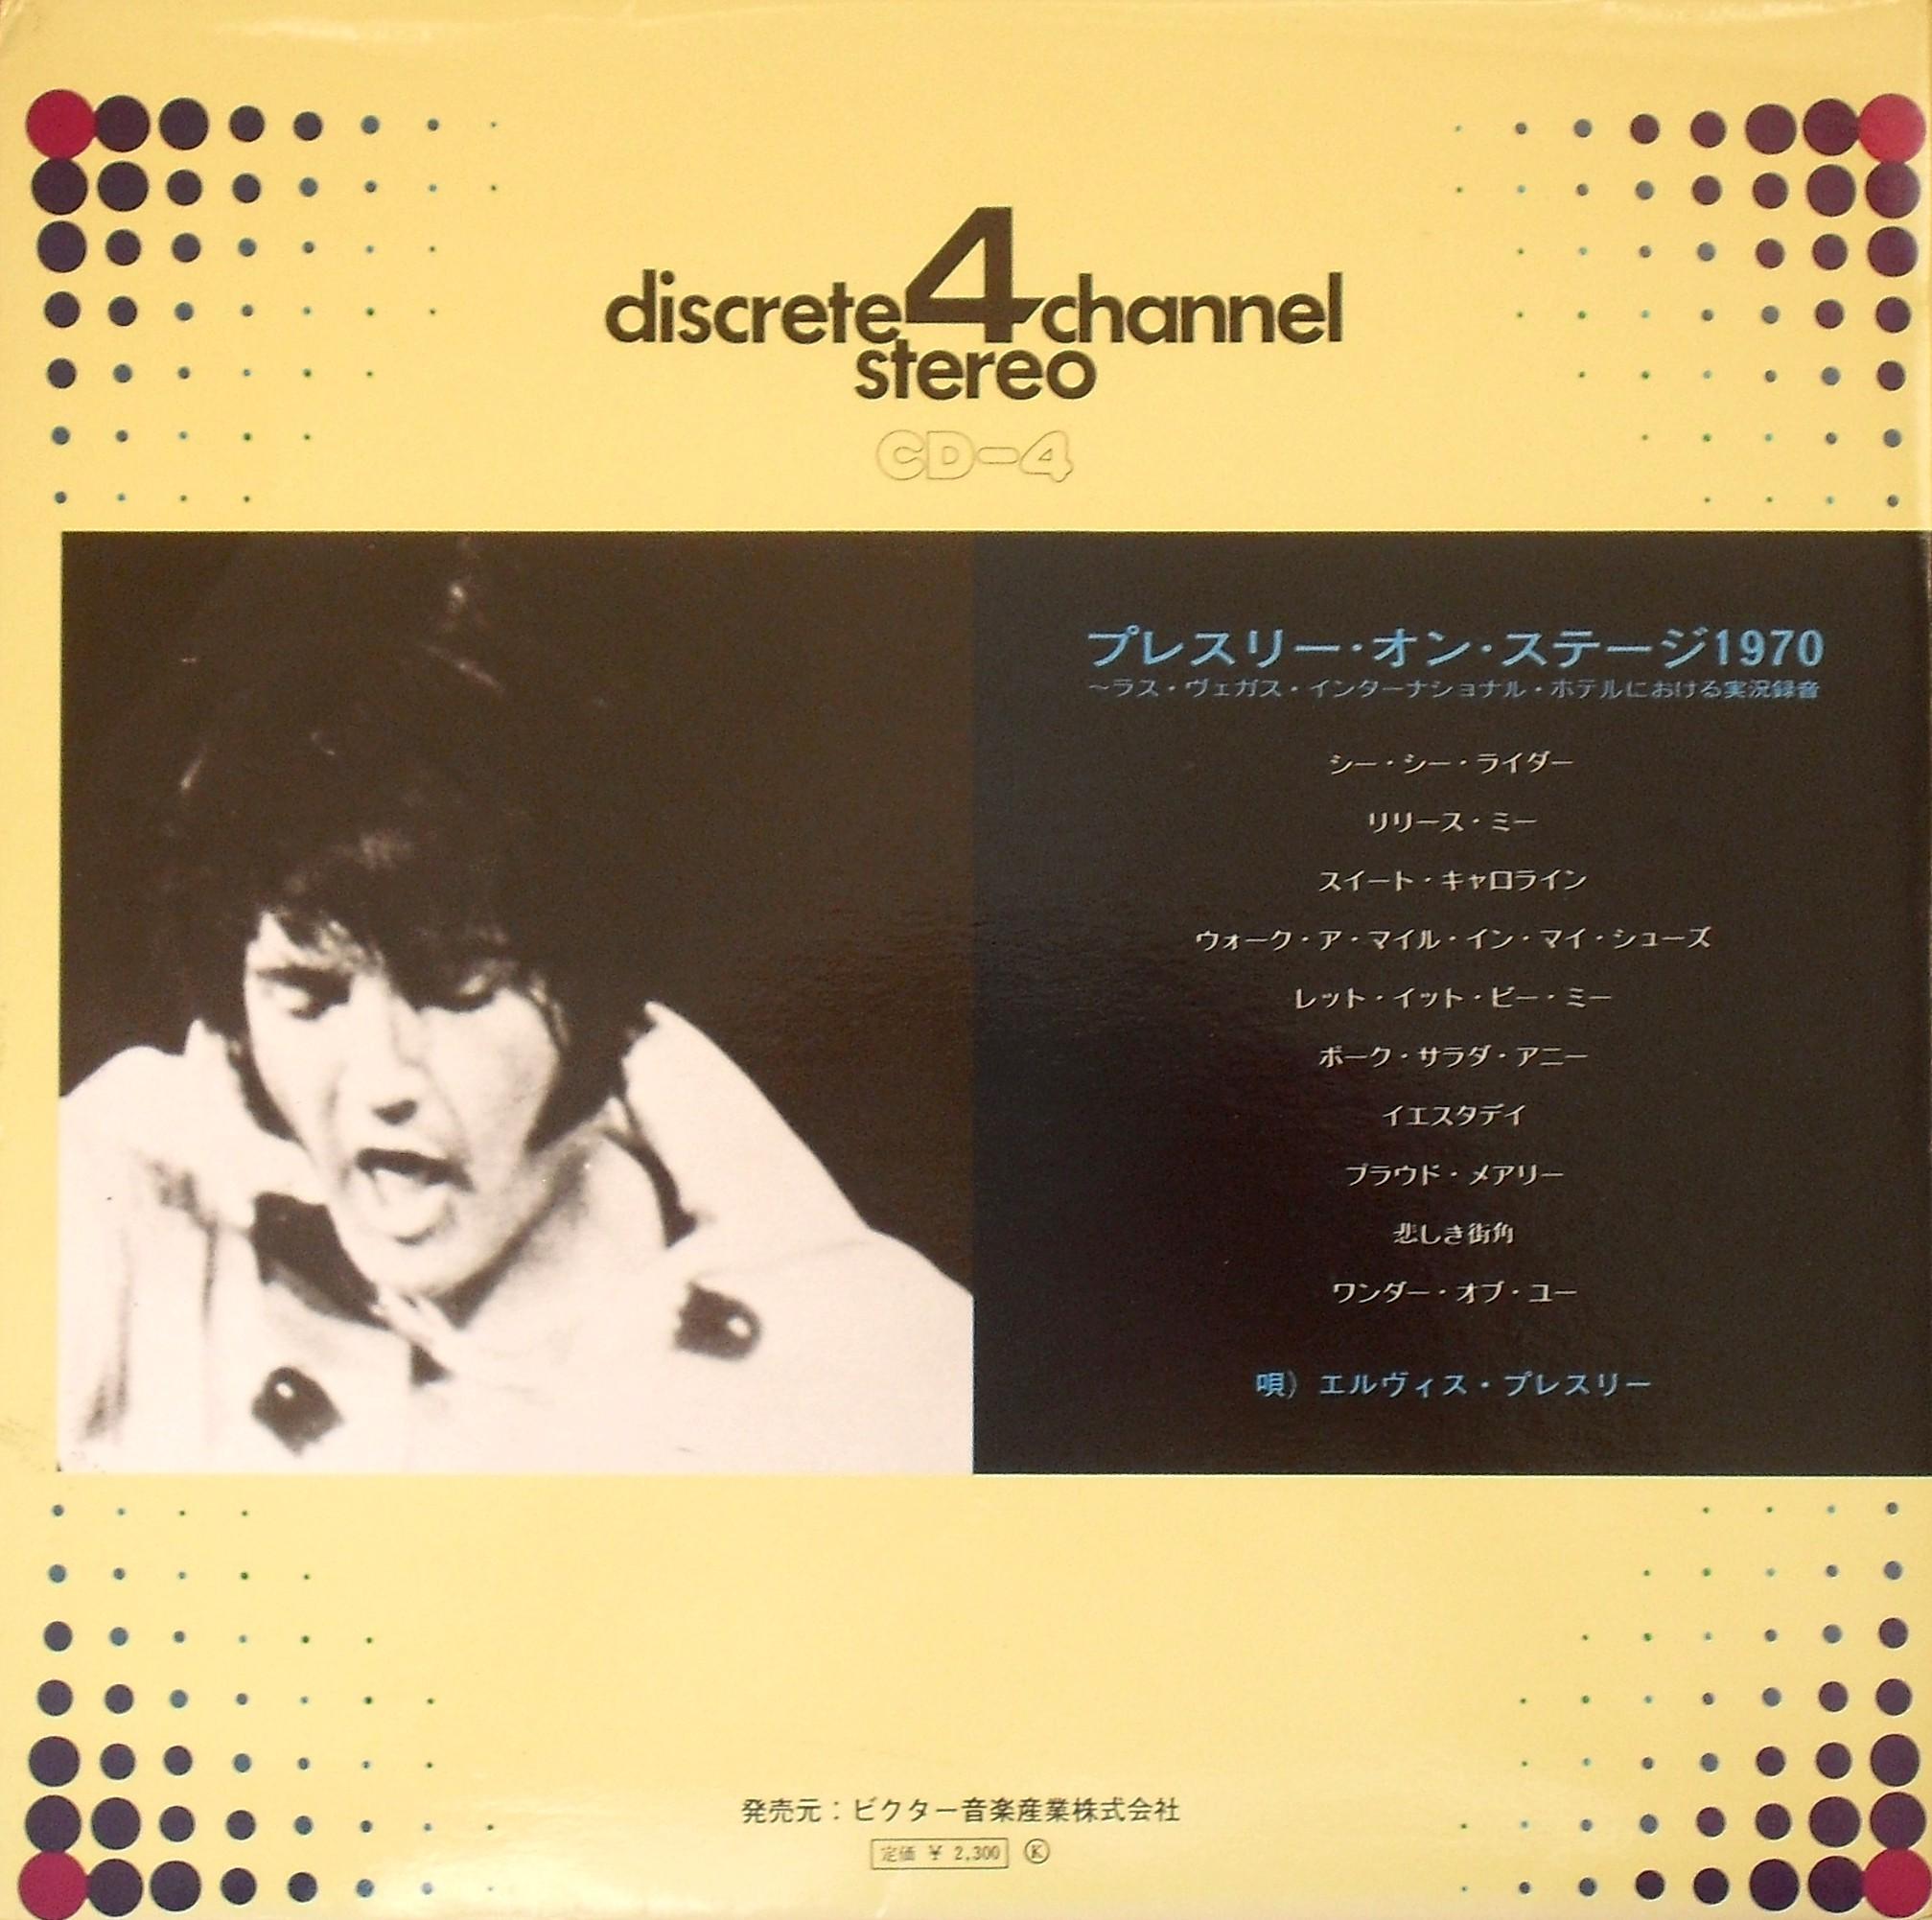 ON STAGE - FEBRUARY, 1970 03ujuin